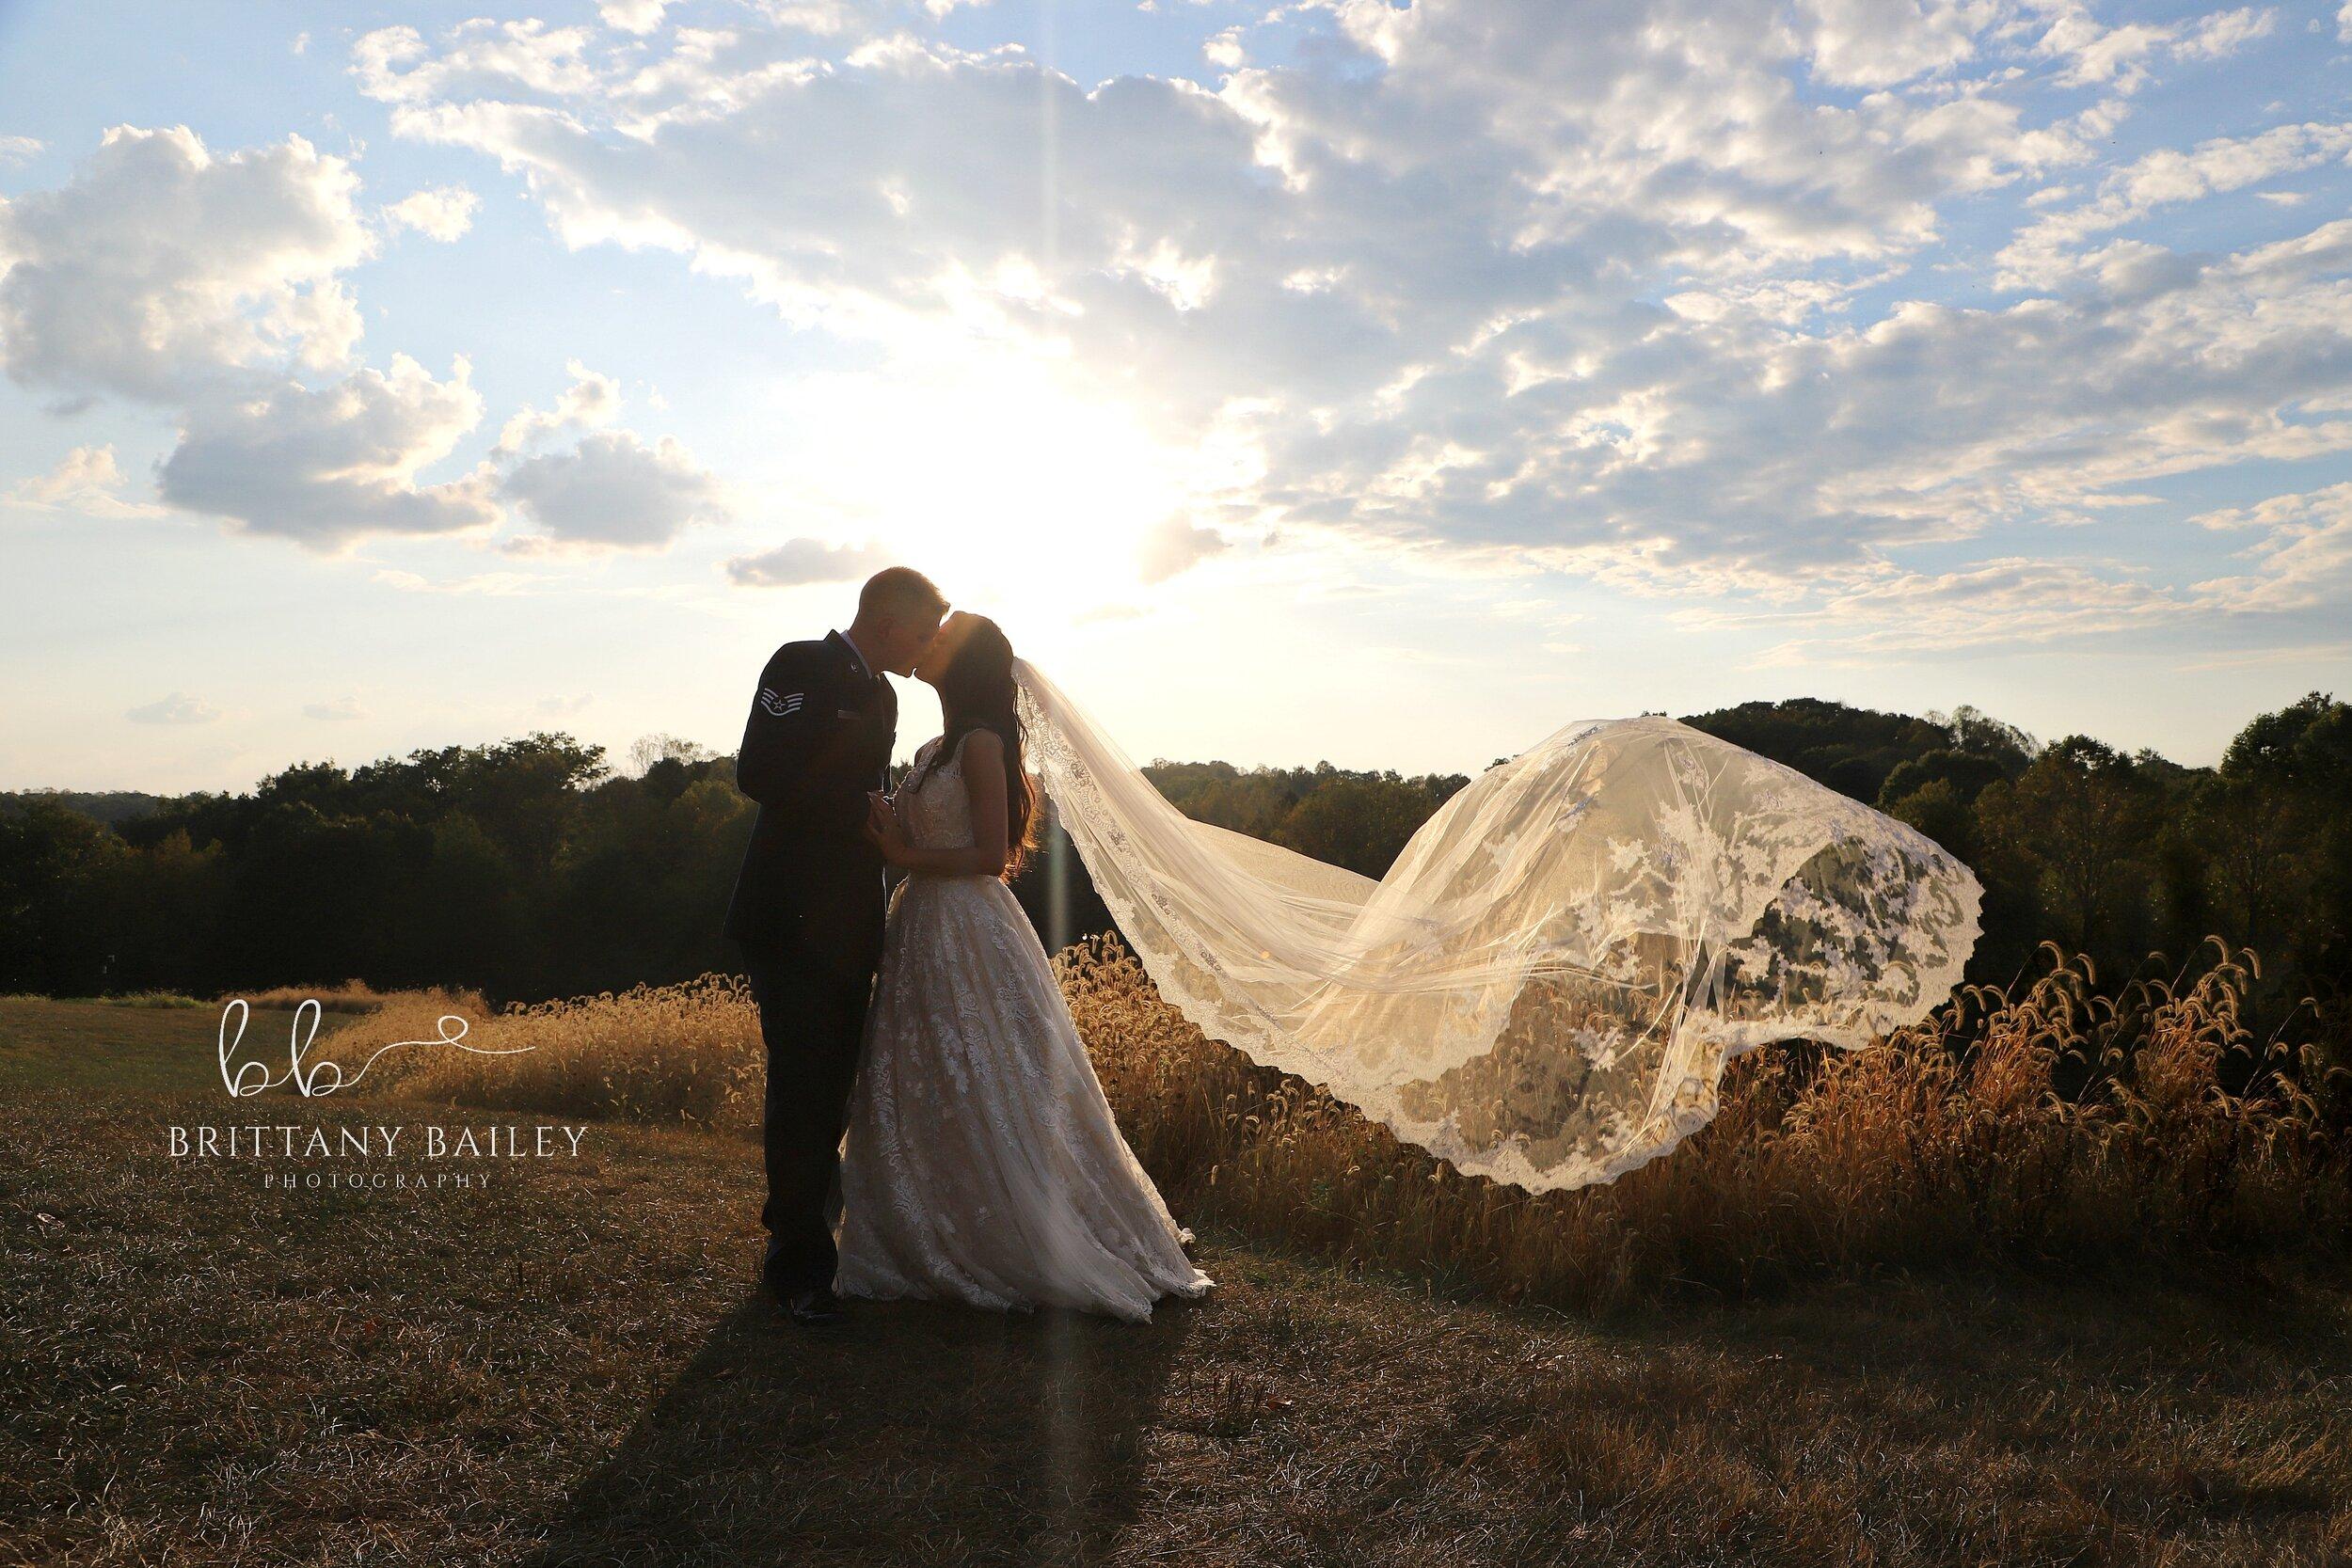 Jobeth-Bryce-WeddingDay-1.jpg